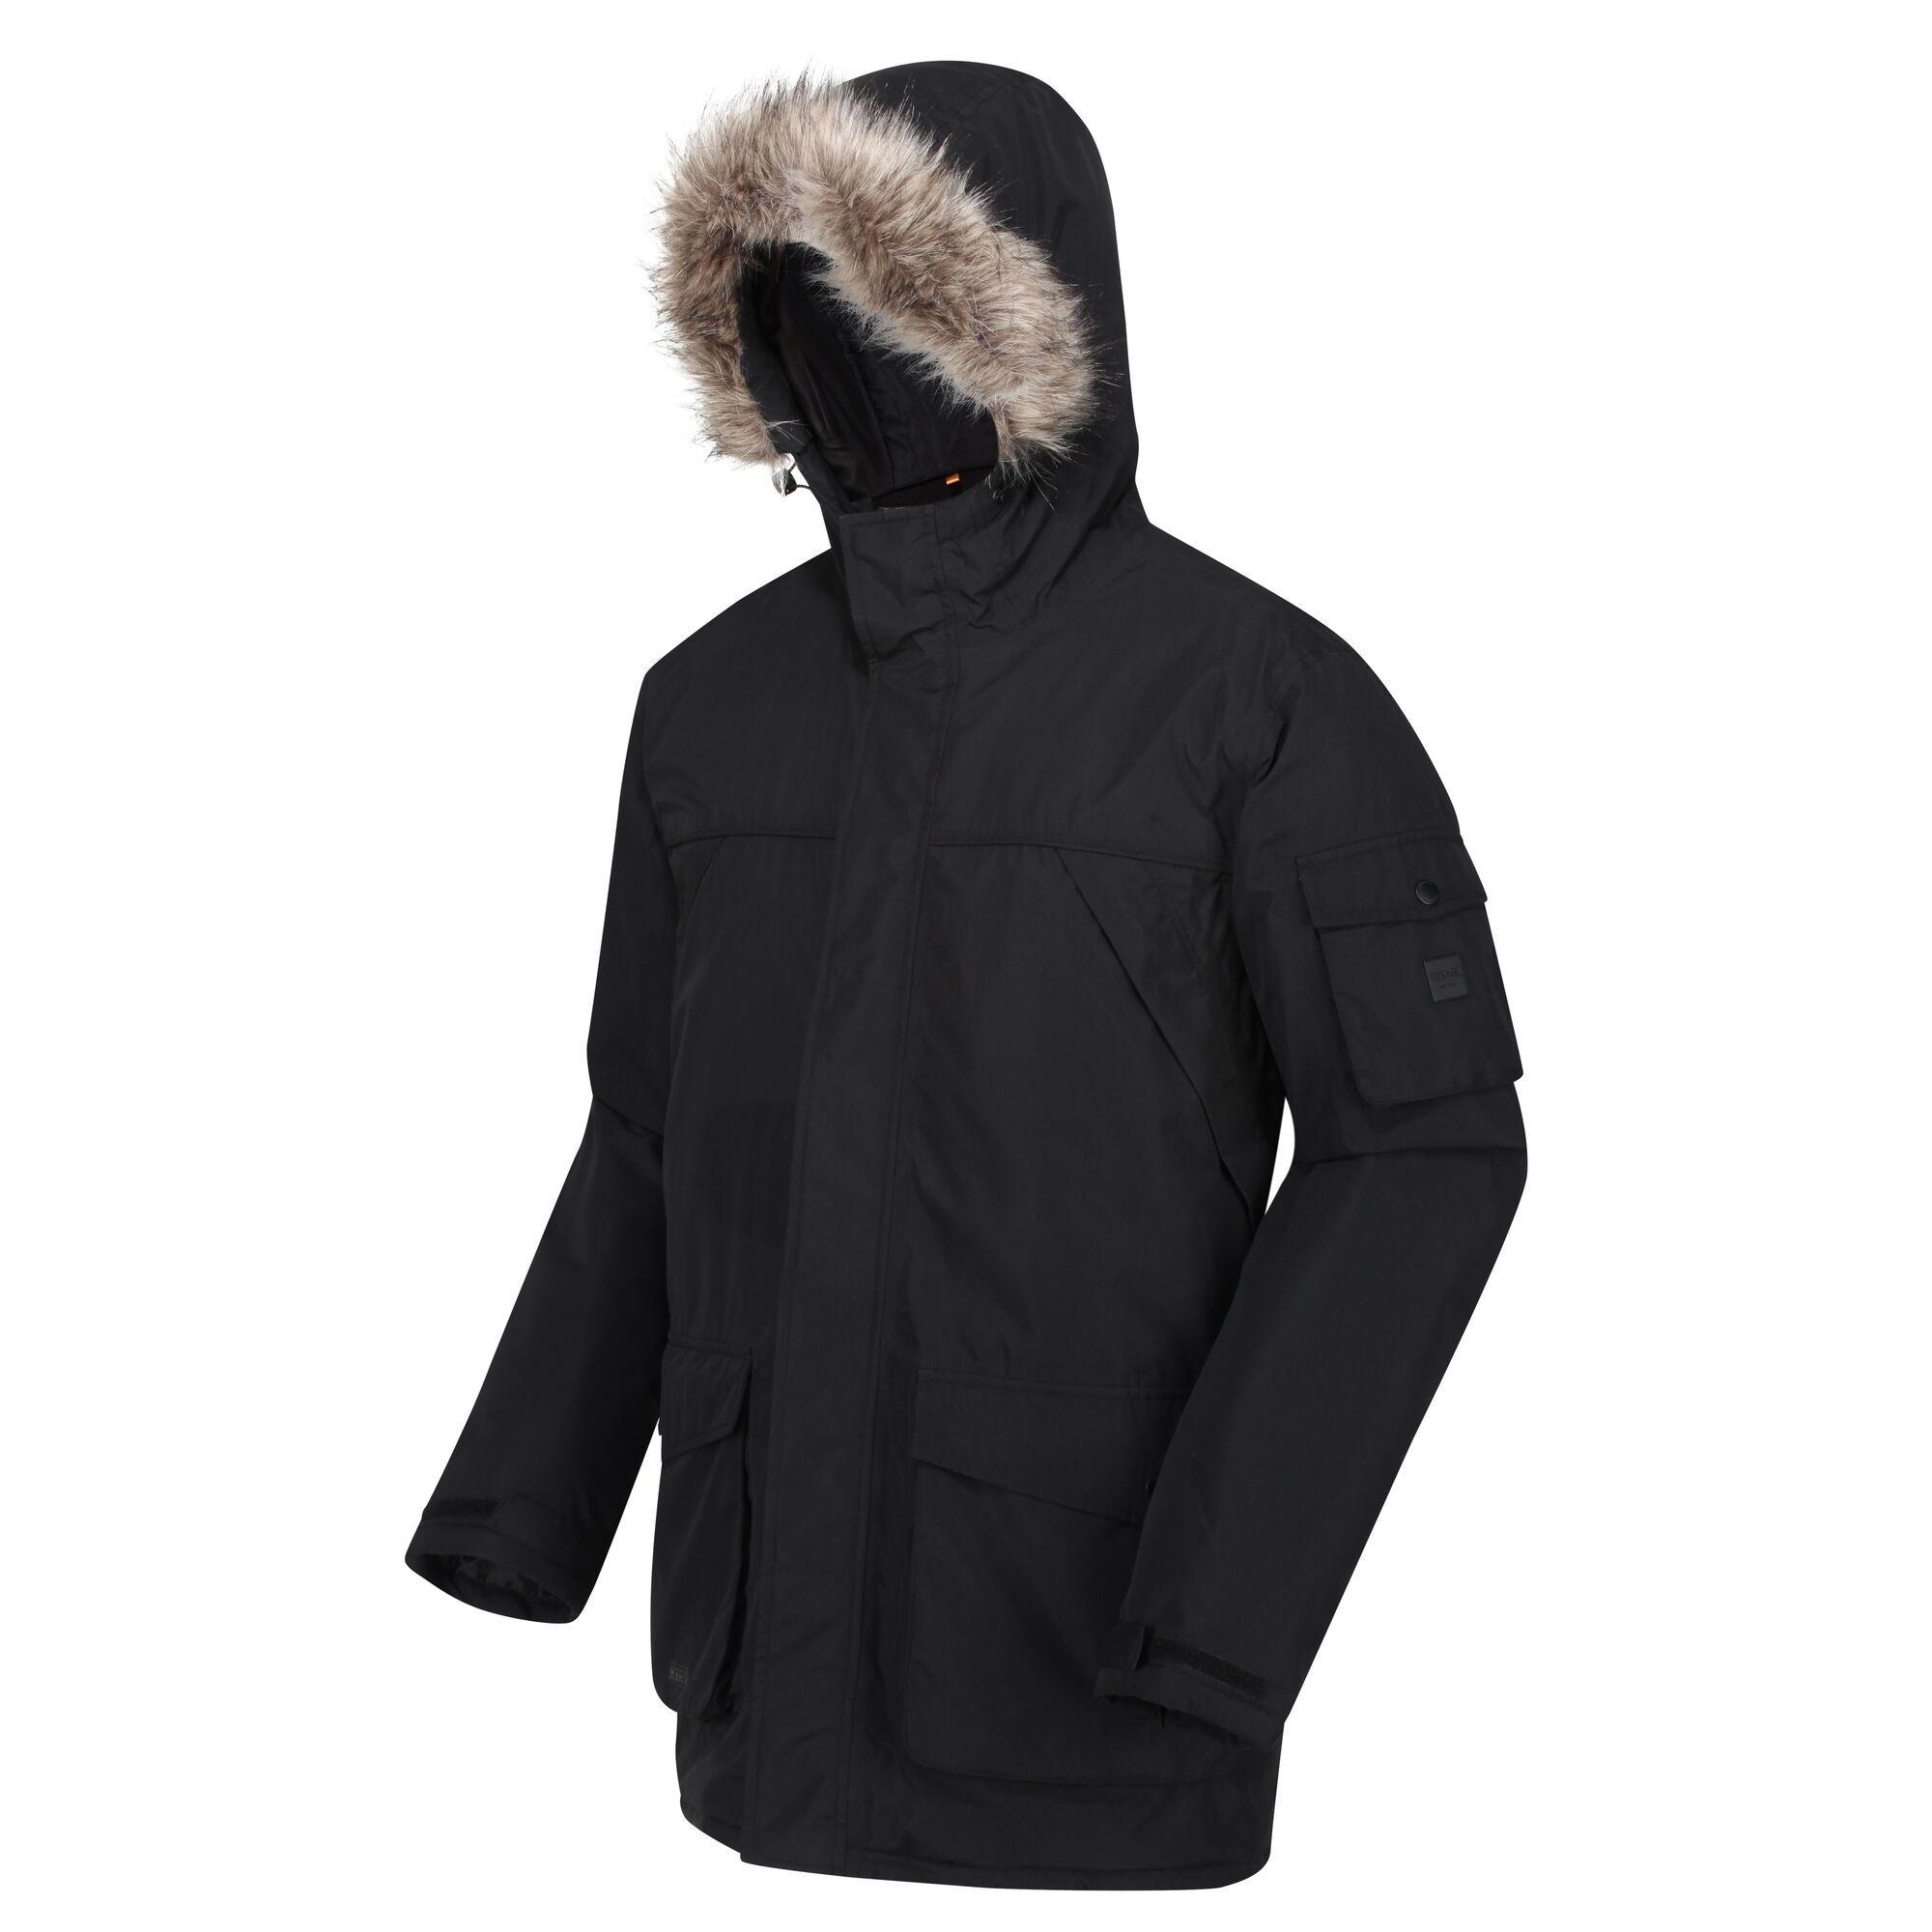 Men's Parka Jackets